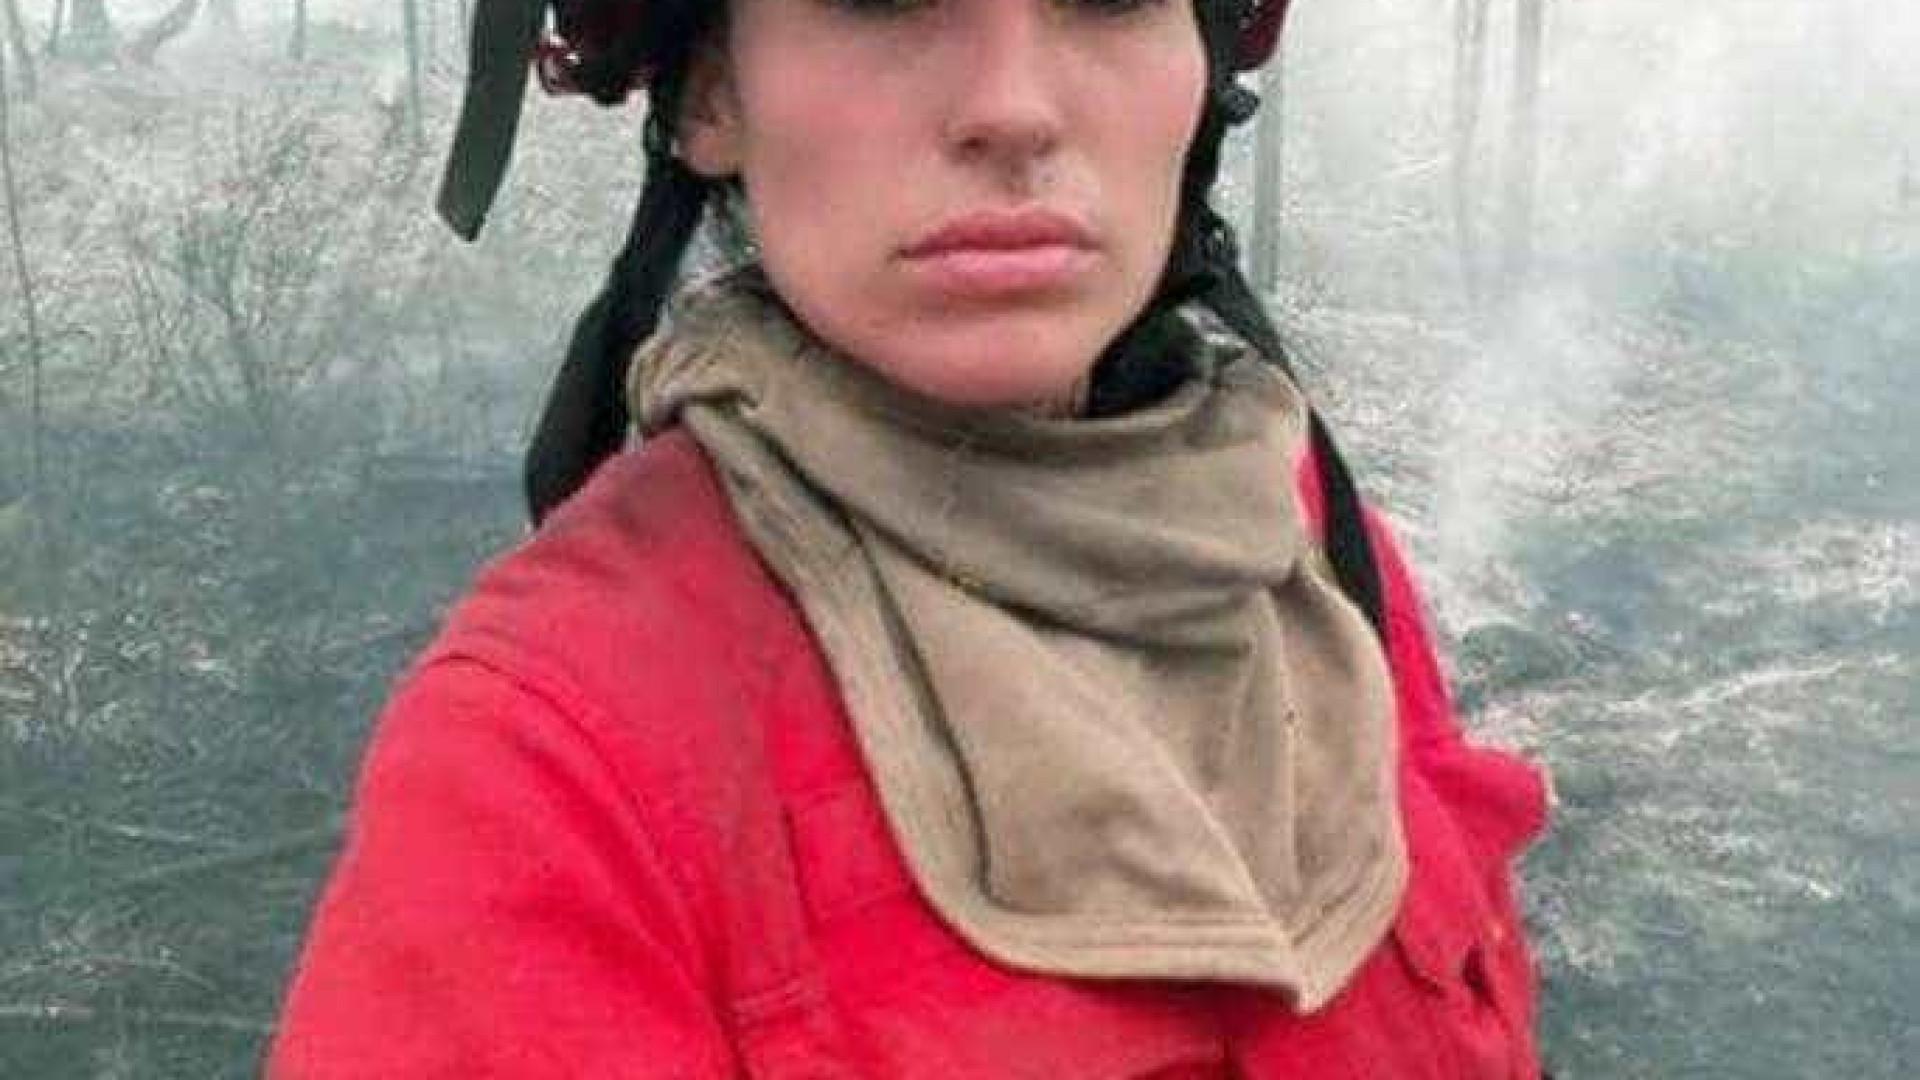 Após elogios e criticas, a verdade sobre bombeira que beleza tornou viral